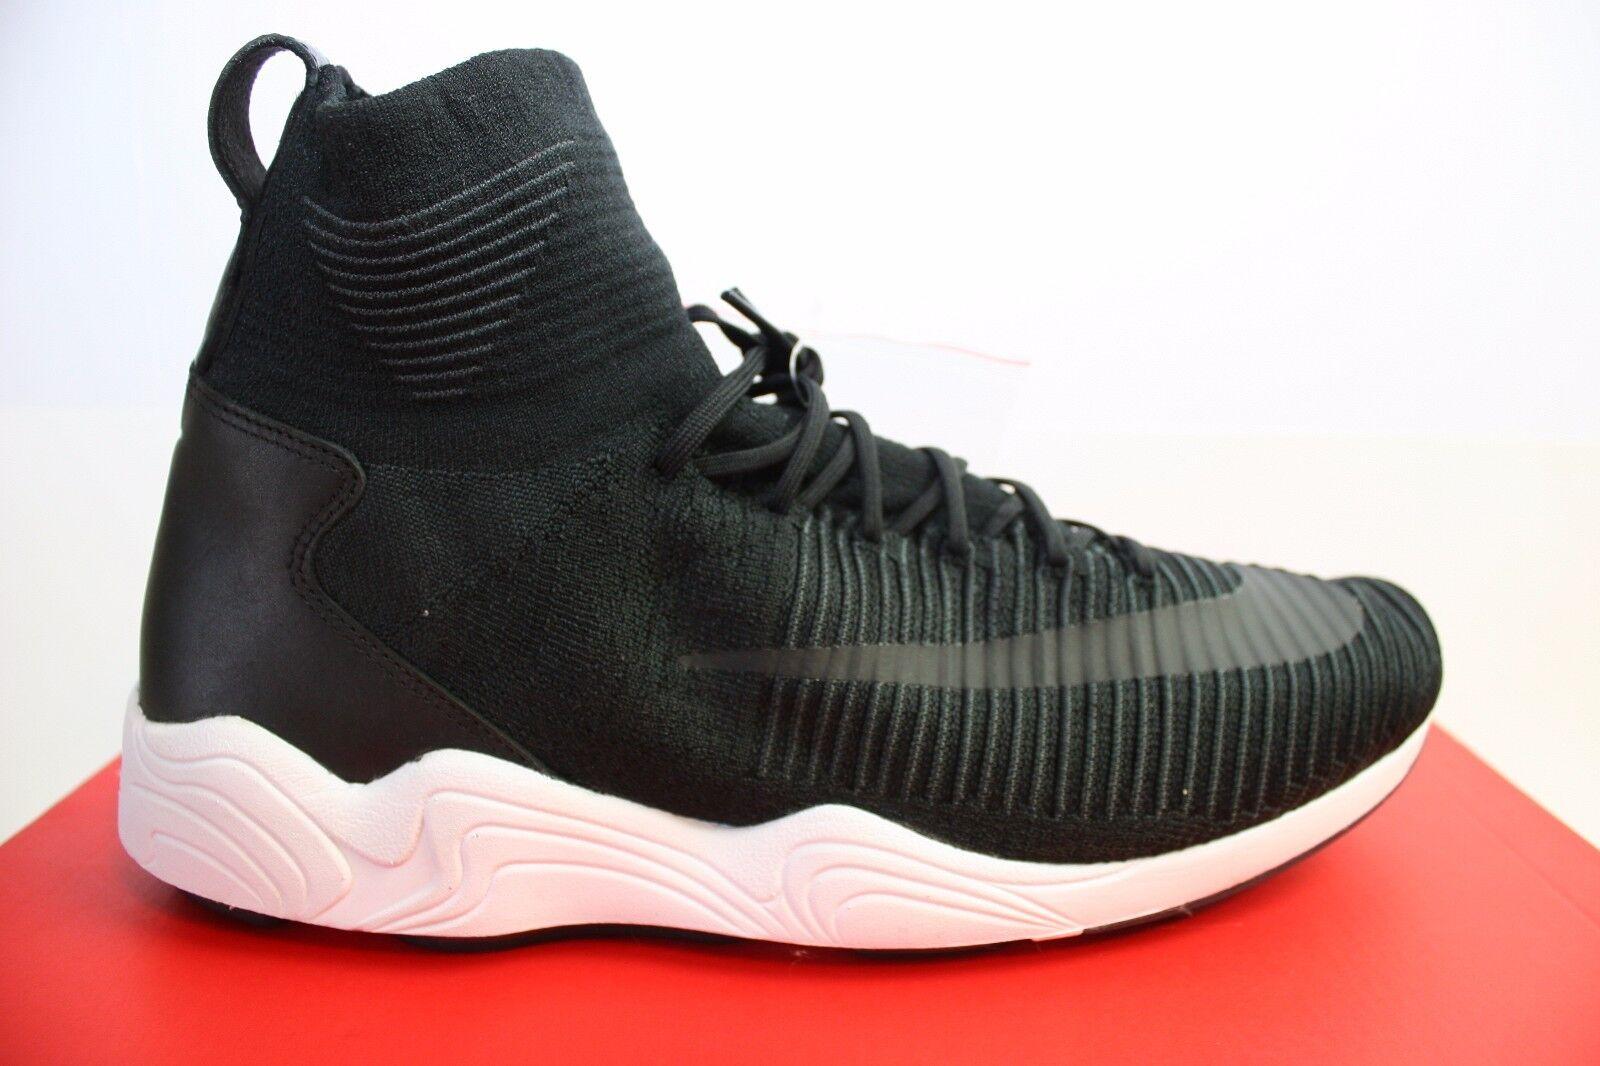 NEW Nike Men's Zoom Mercurial XI FK Trainers Sneakers Shoes 844626 001 Black 11